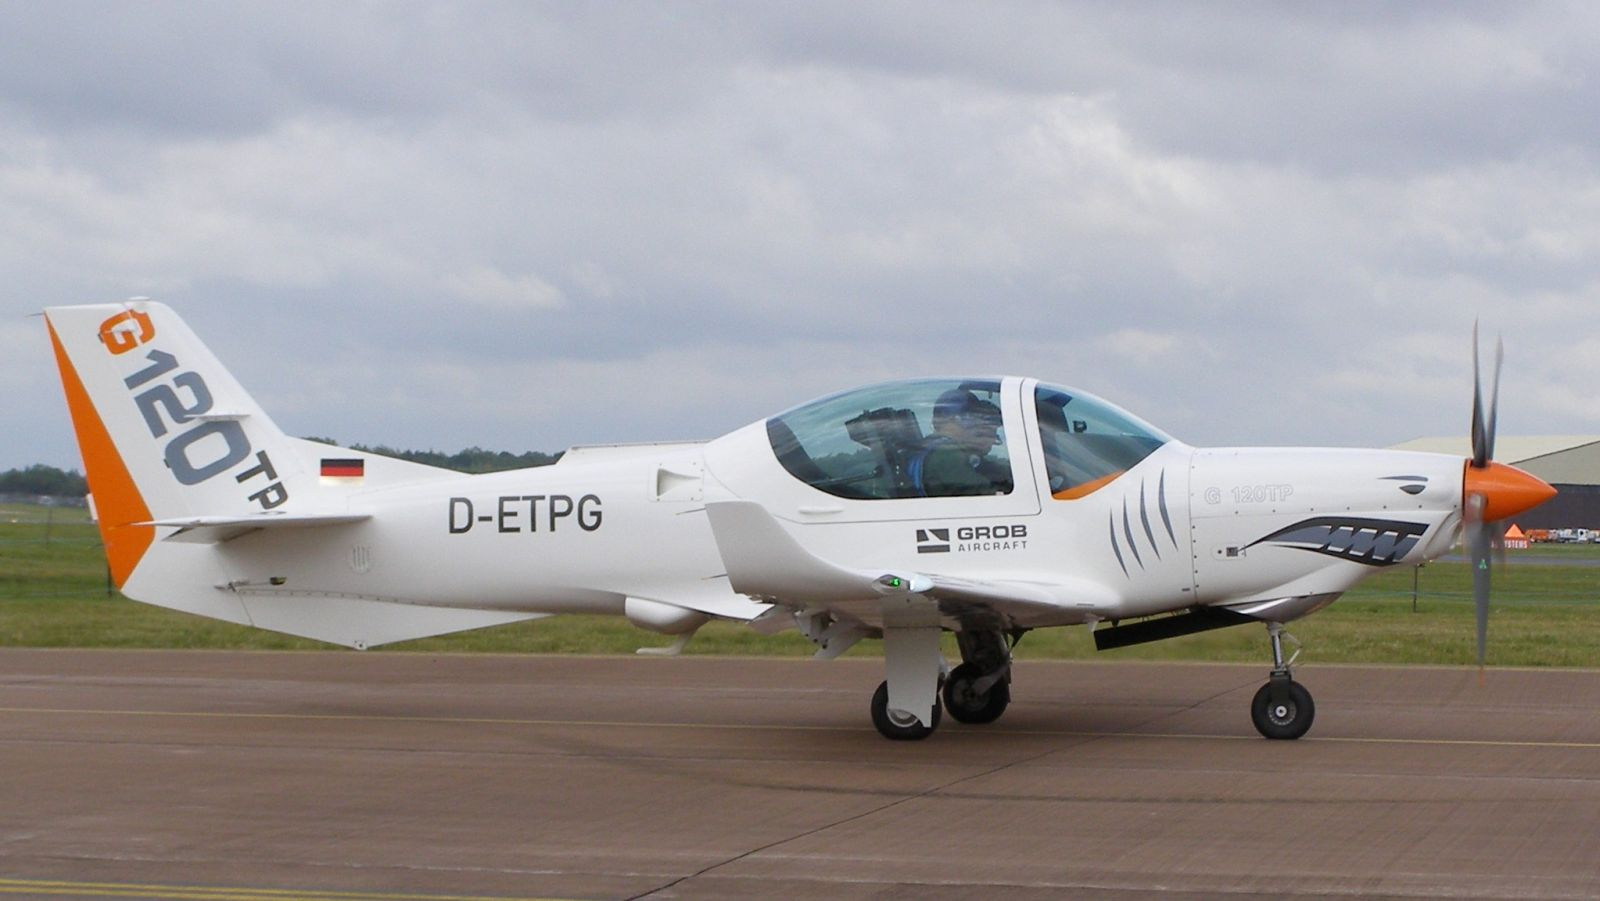 Grob120 D ETPG